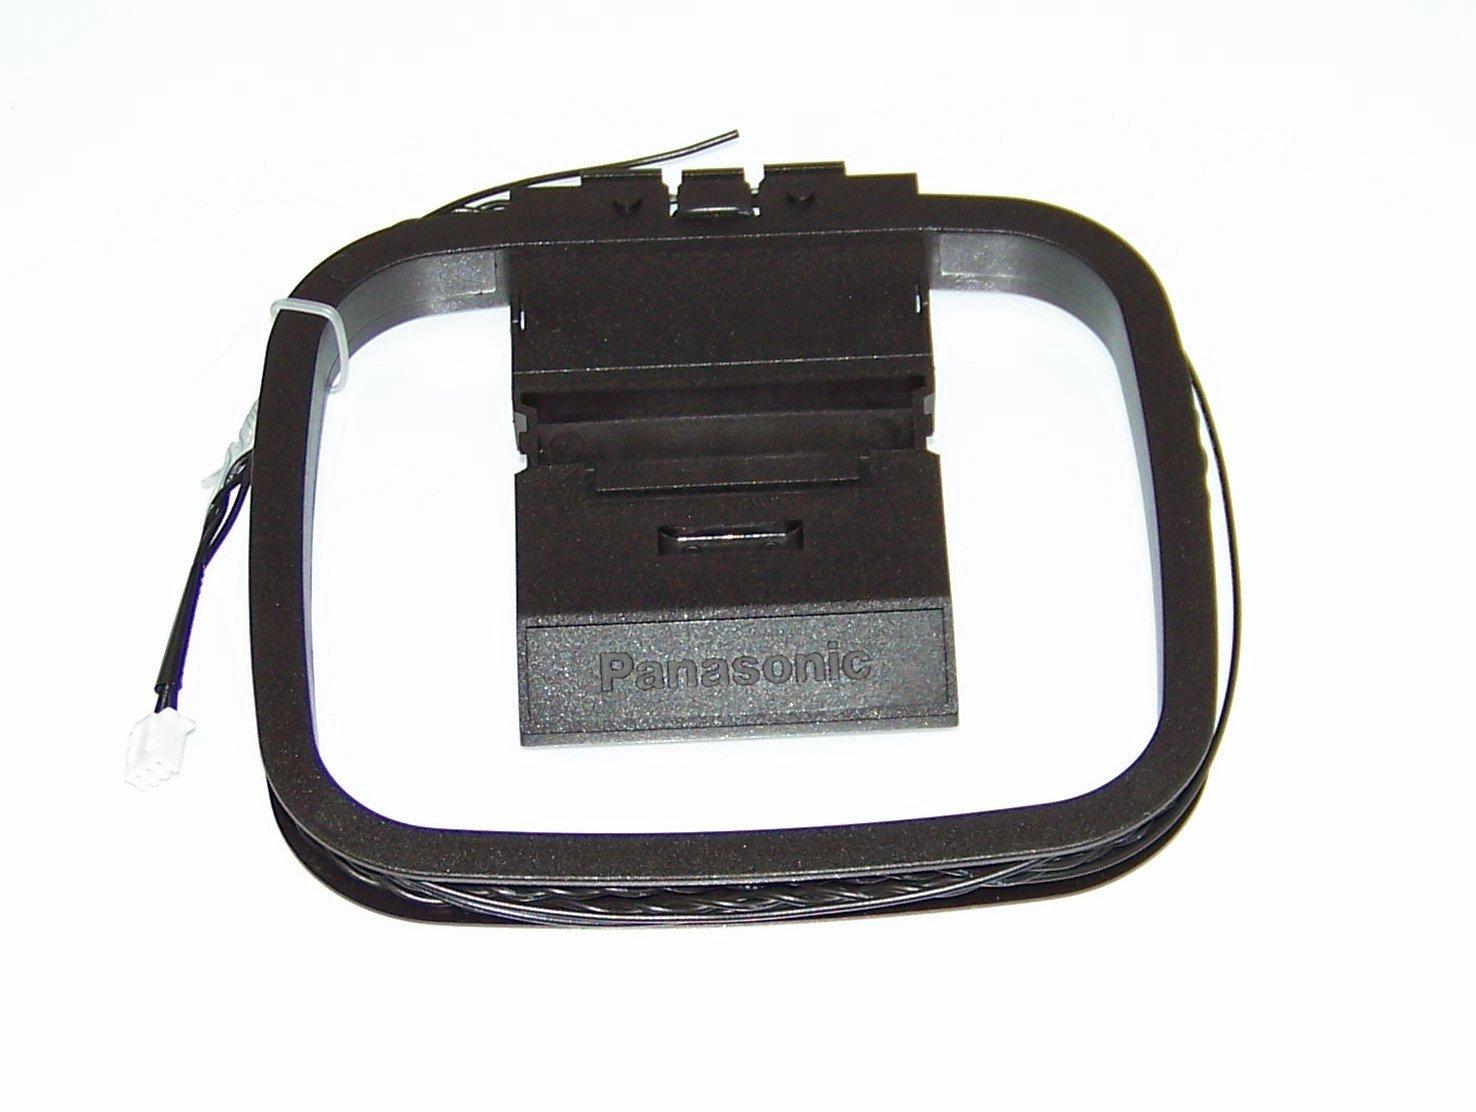 OEM Panasonic FM & AM Loop Antenna: SAEN25, SA-EN25, SCEN26, SC-EN26, SCEN25, SC-EN25